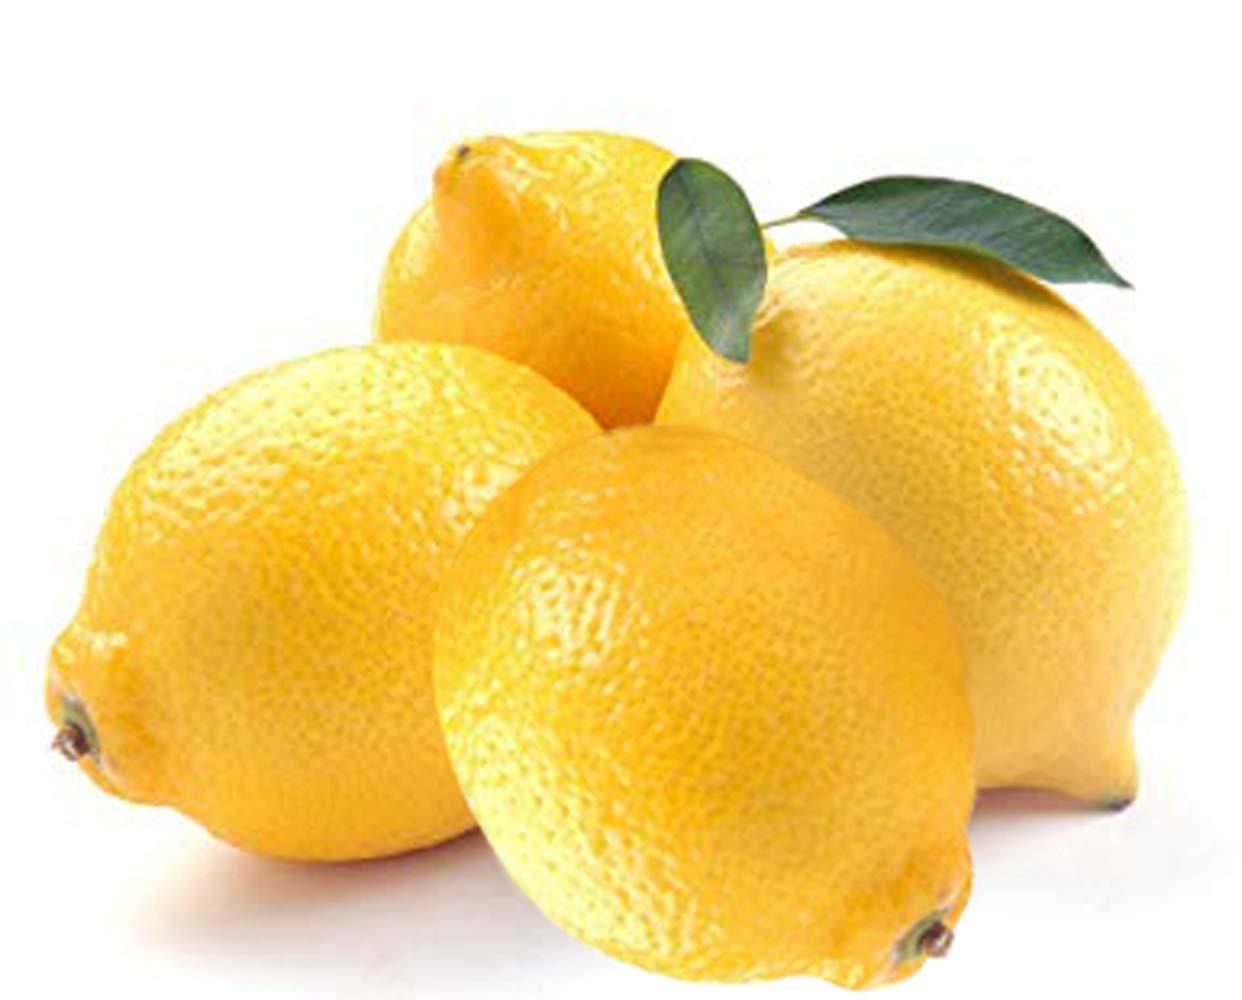 Manfaat Lemon Untuk Ginjal Dan Kandung Kemih